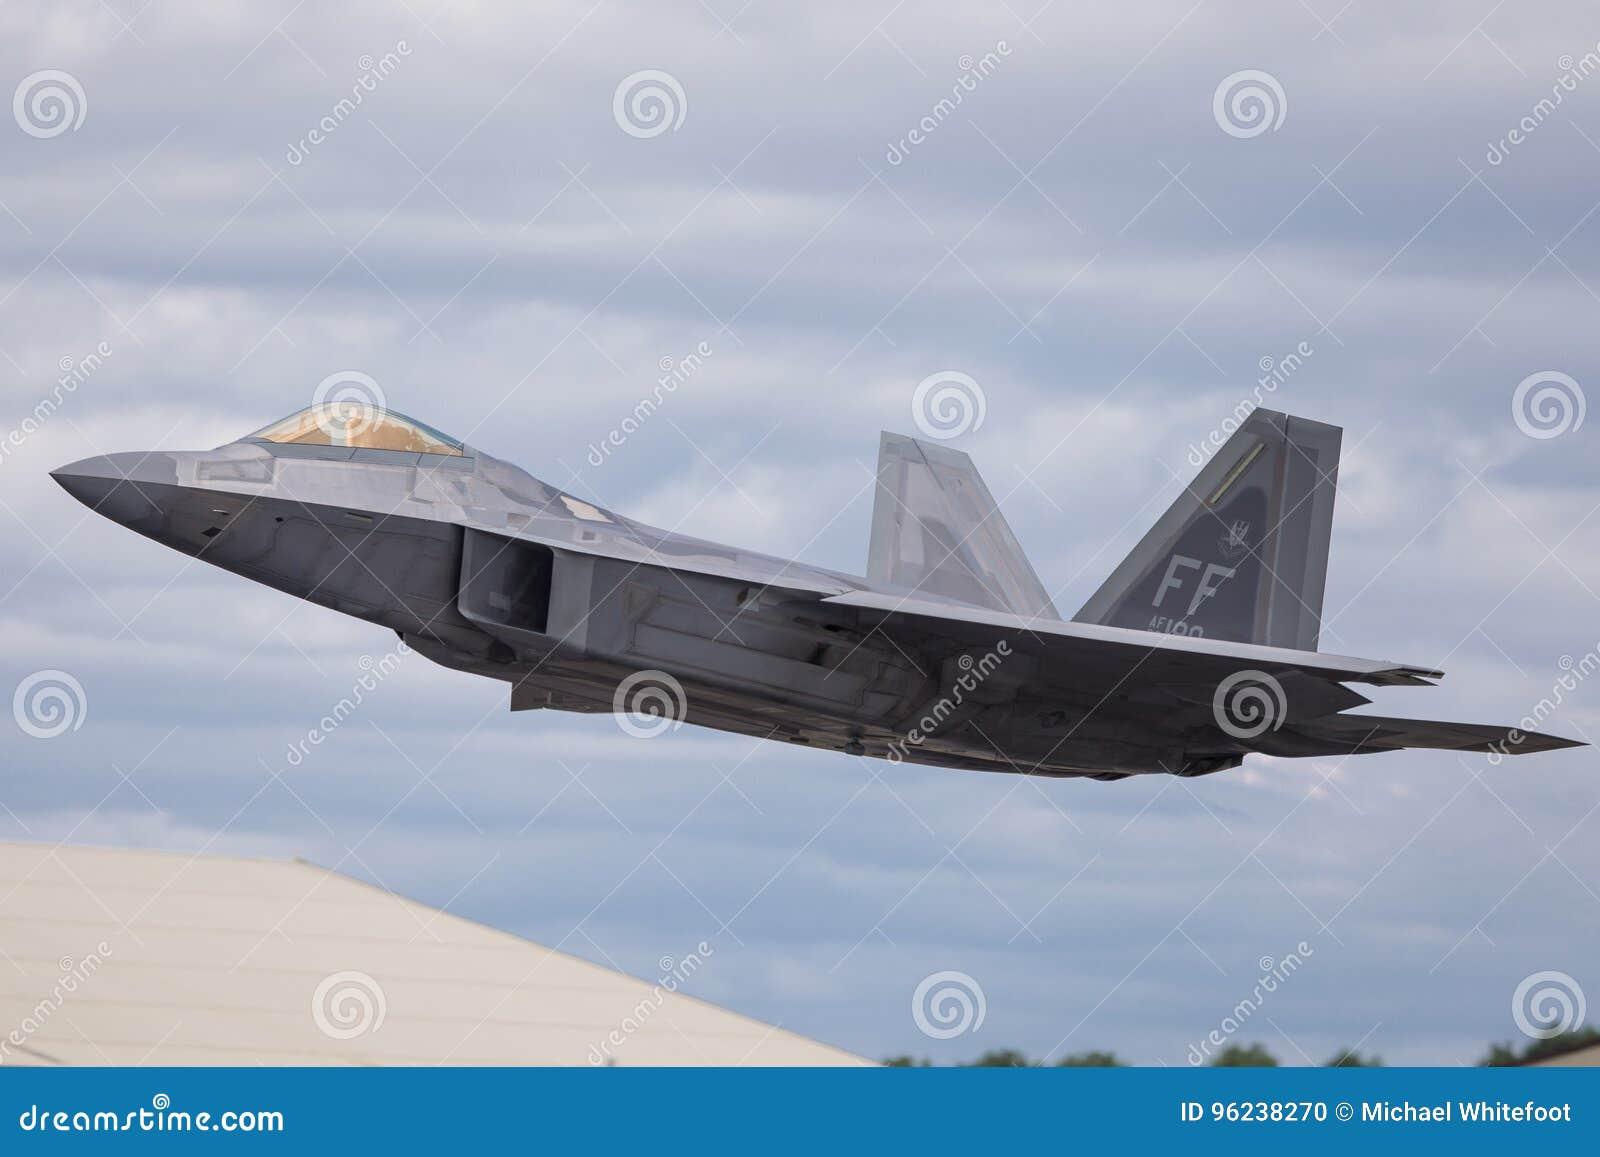 Lockheed Martin F-22 Raptor Editorial Image - Image of